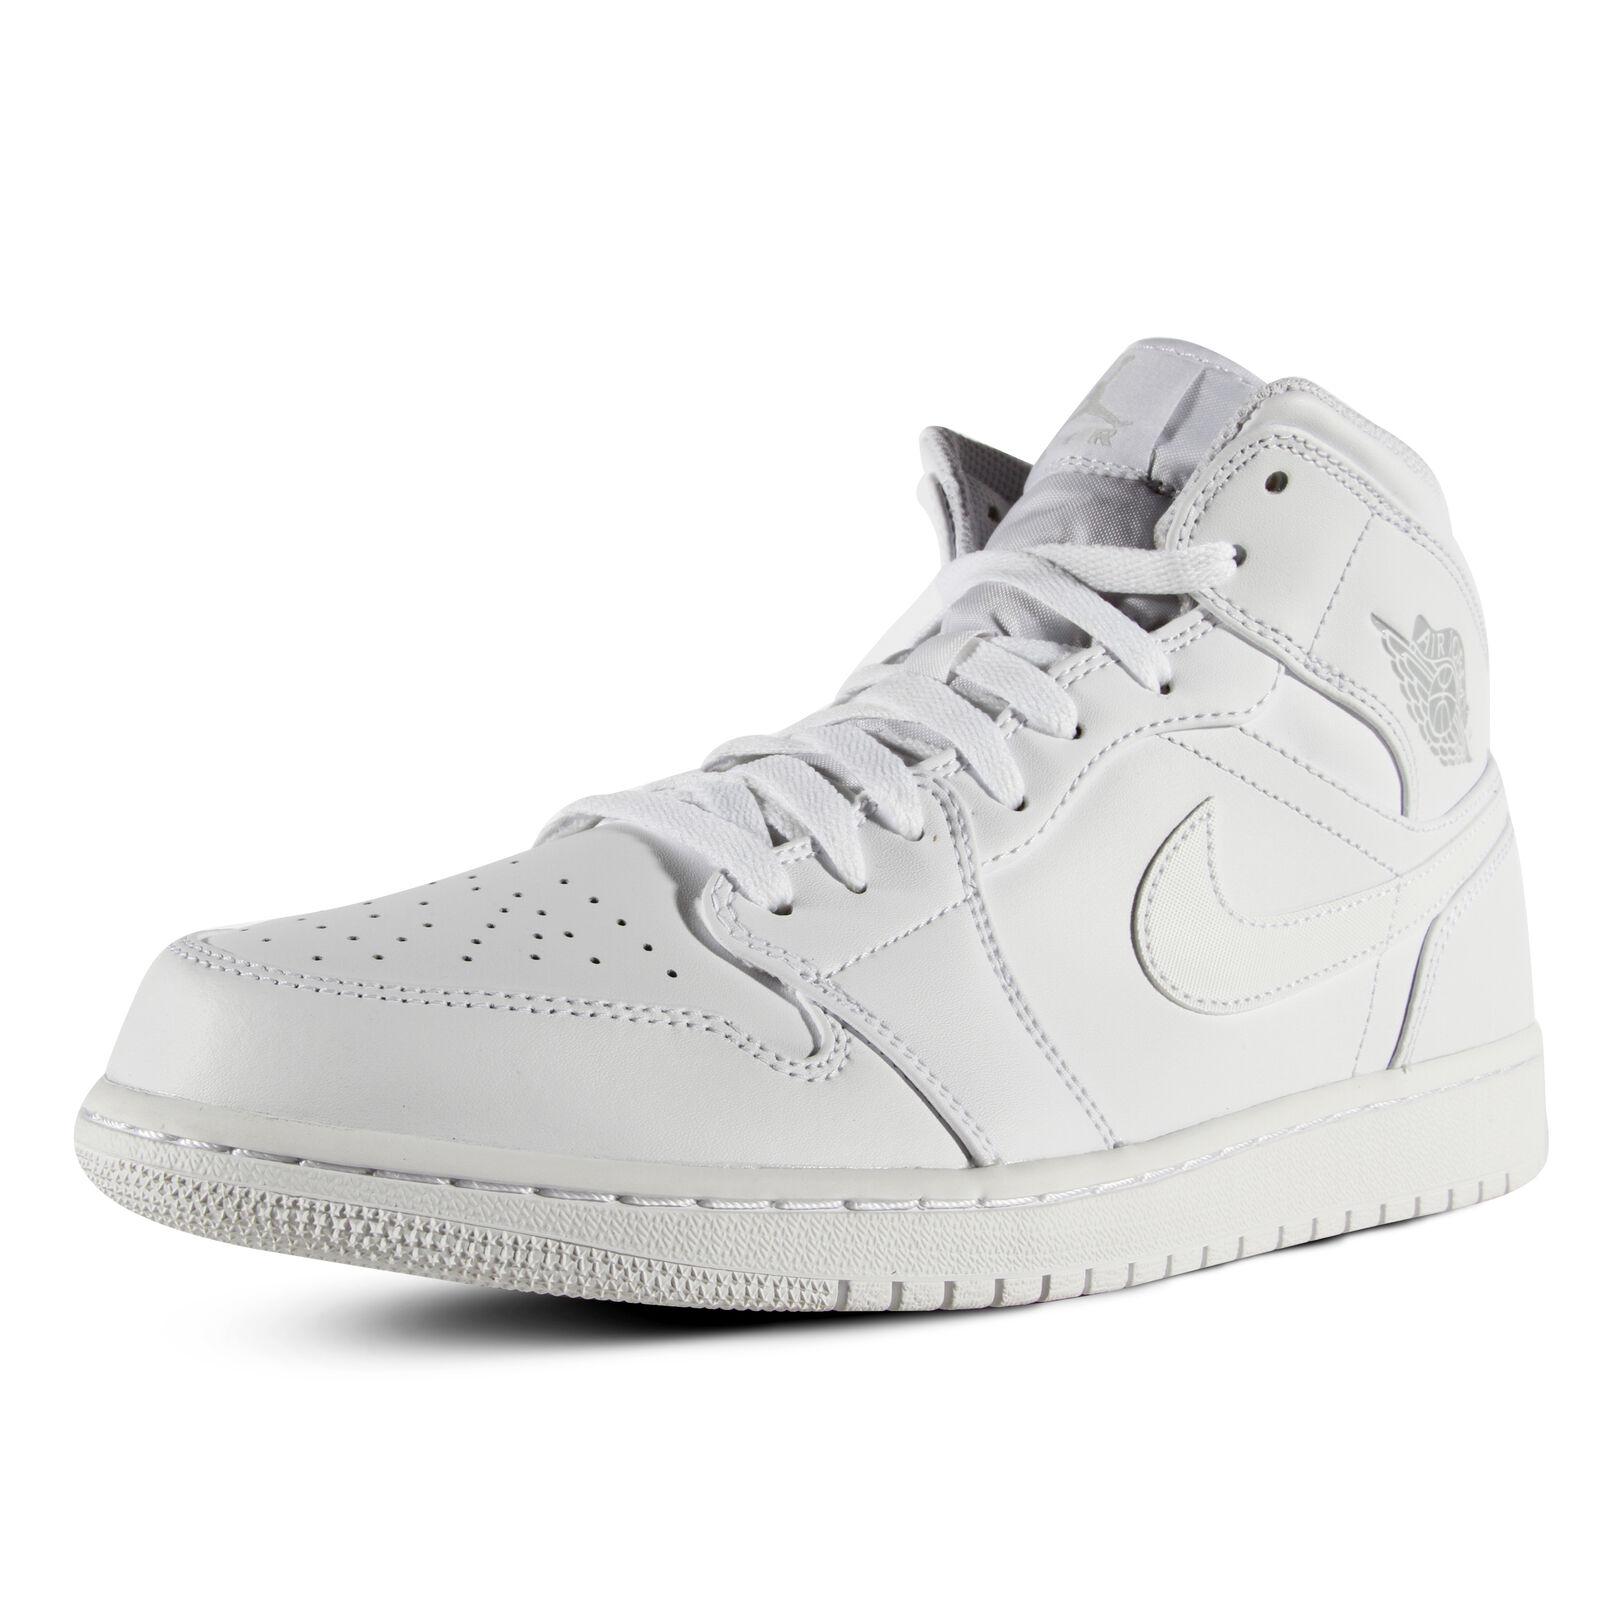 Men's Air Jordan 1 Mid Sport Casual Shoes 554724-104